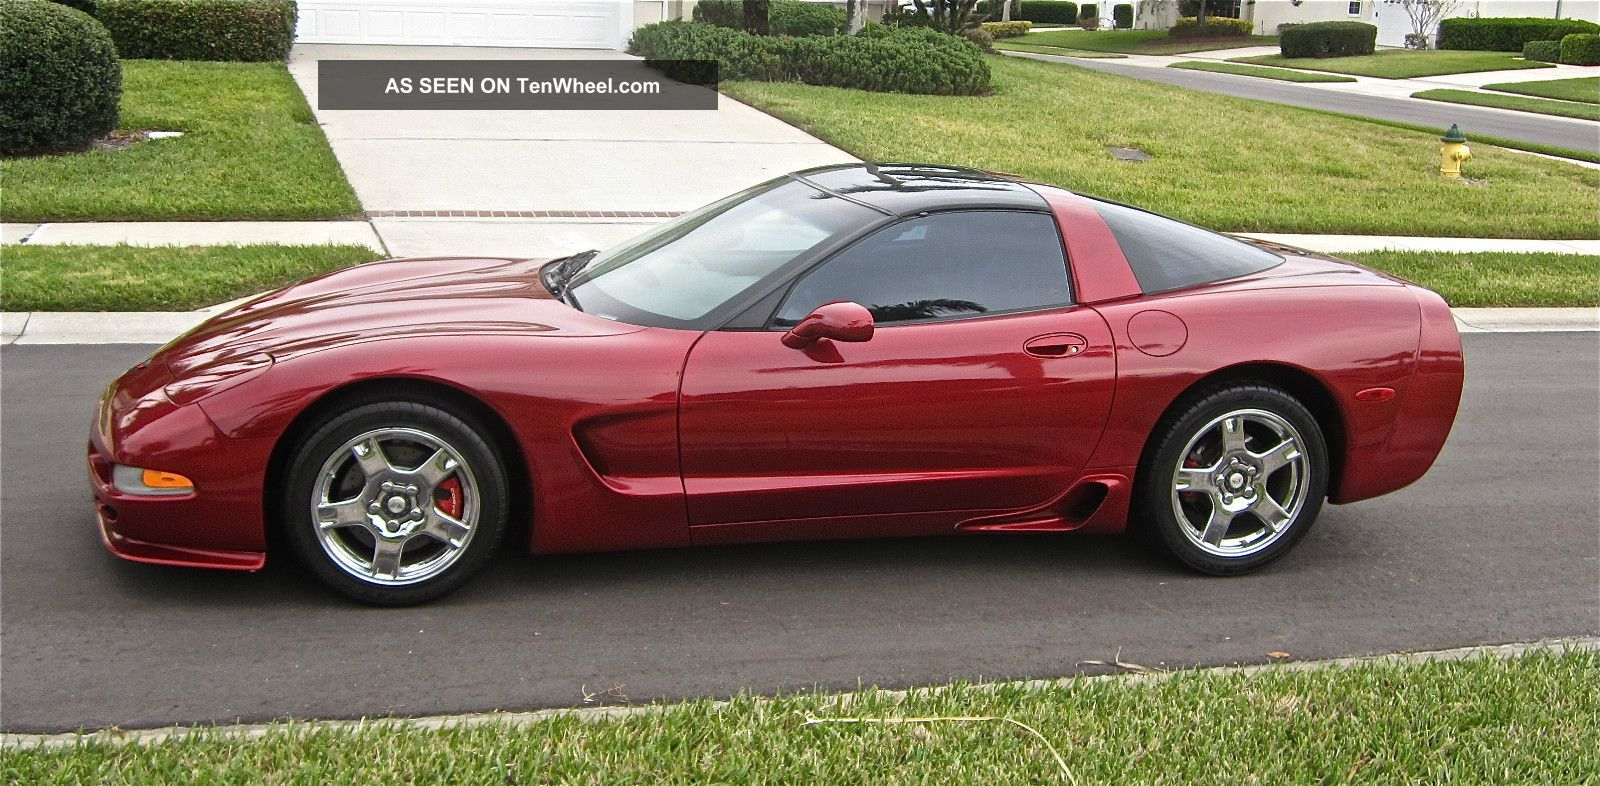 Volkswagen Gti Vr6 Specs >> 1997 Chevrolet Corvette C5